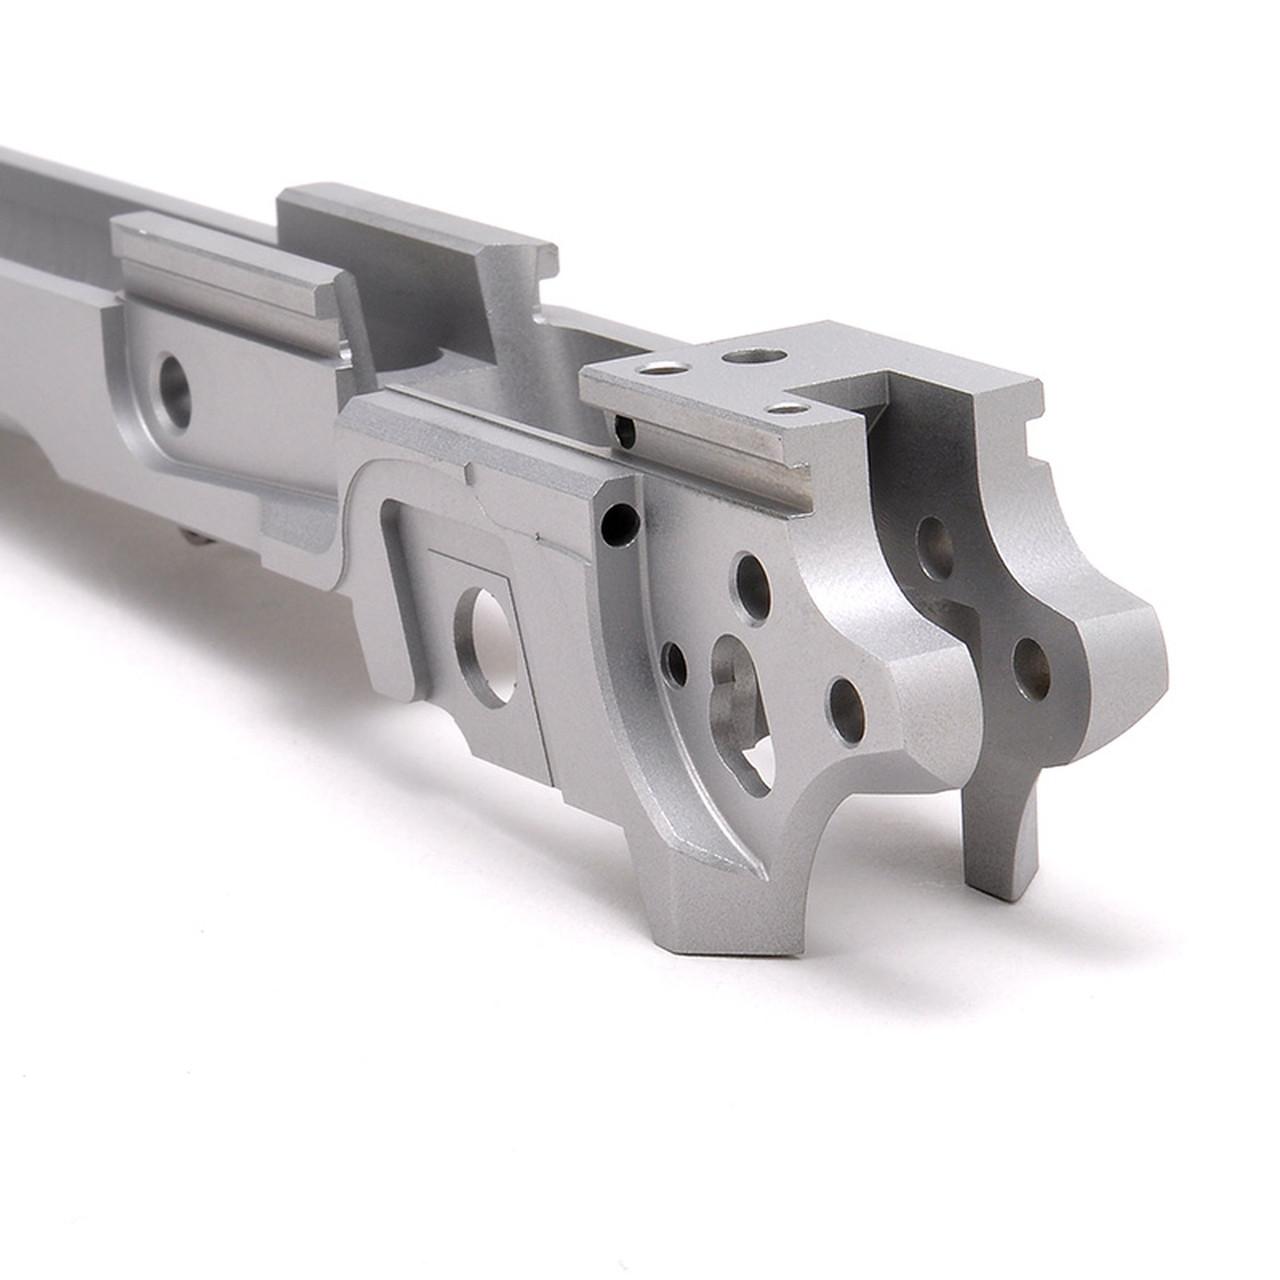 Cheely Custom Gunworks LDC Serialized Frame - Tactical Rail (Clark Para) (Restricted Firearm)